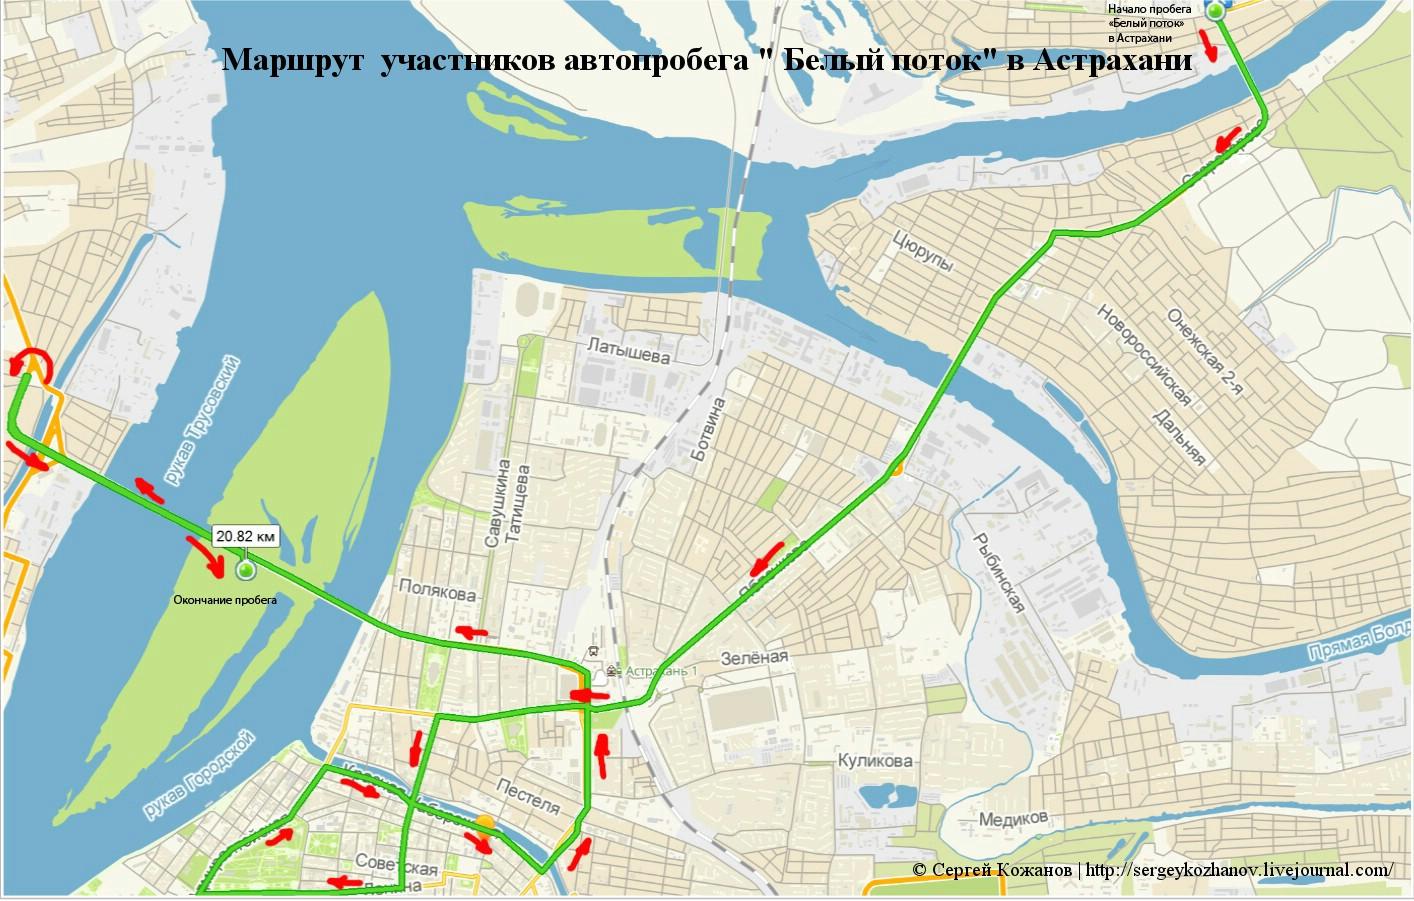 Маршрут  участников автопробега « Белый поток» в Астрахани